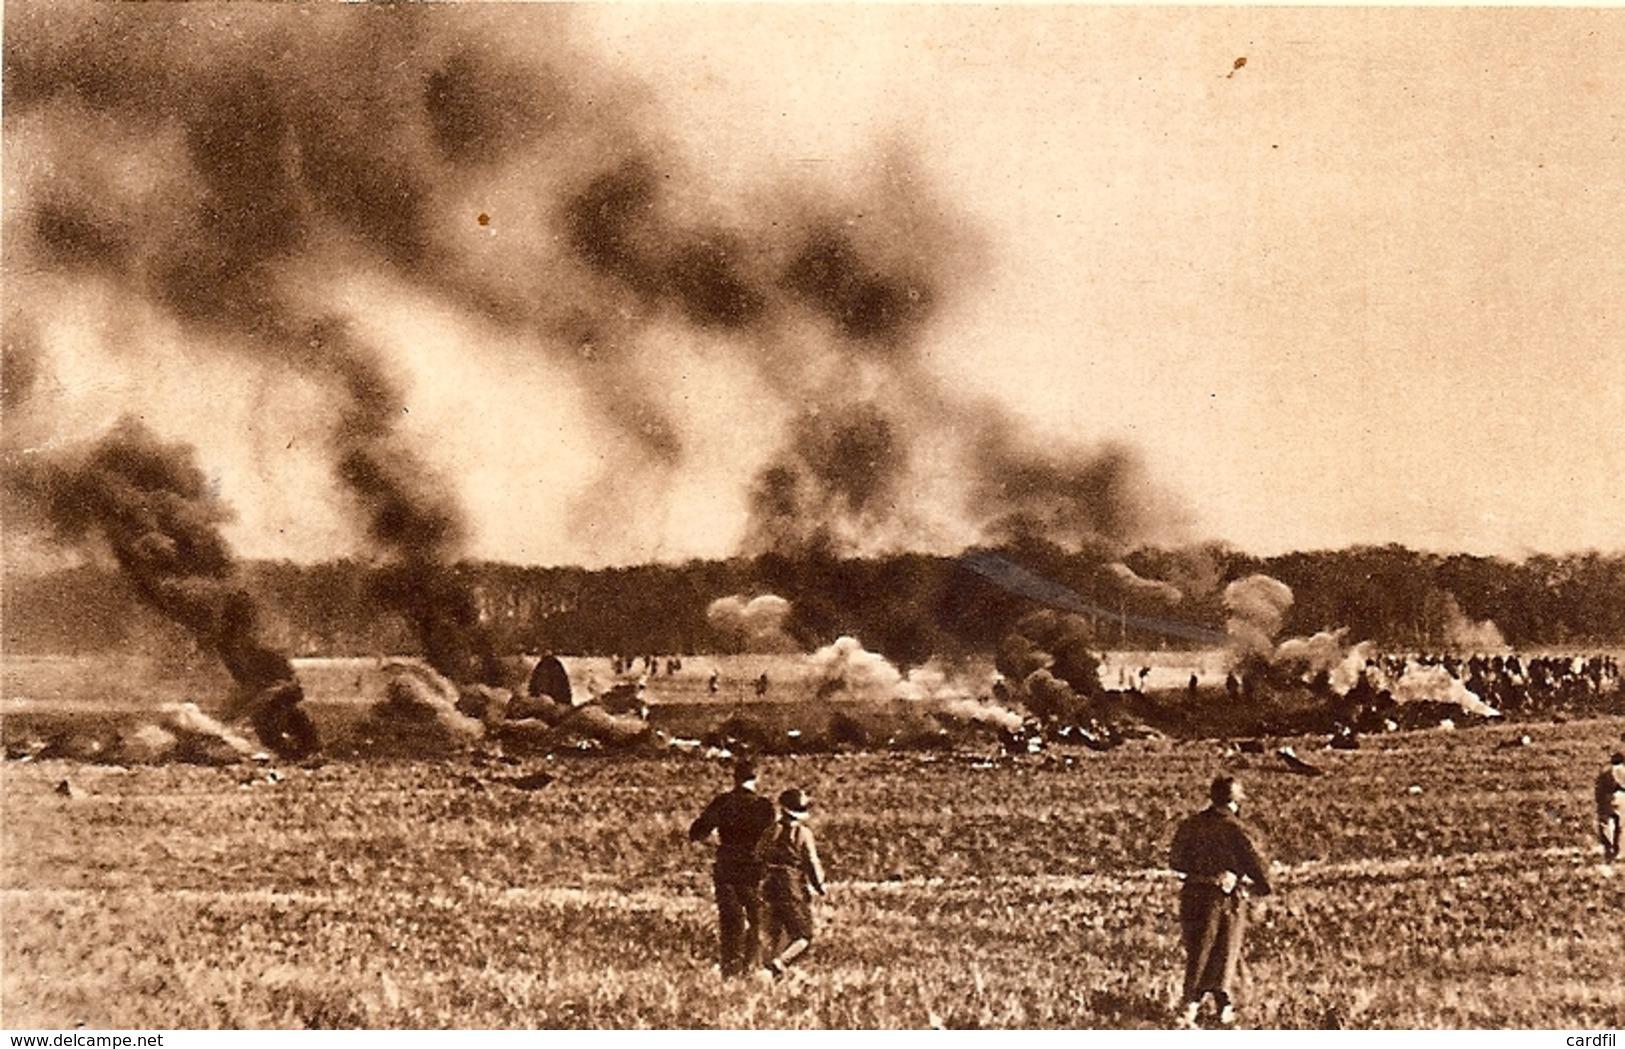 57 BOULAY Bombardier Abattu 2ème Guerre Mondiale - Boulay Moselle